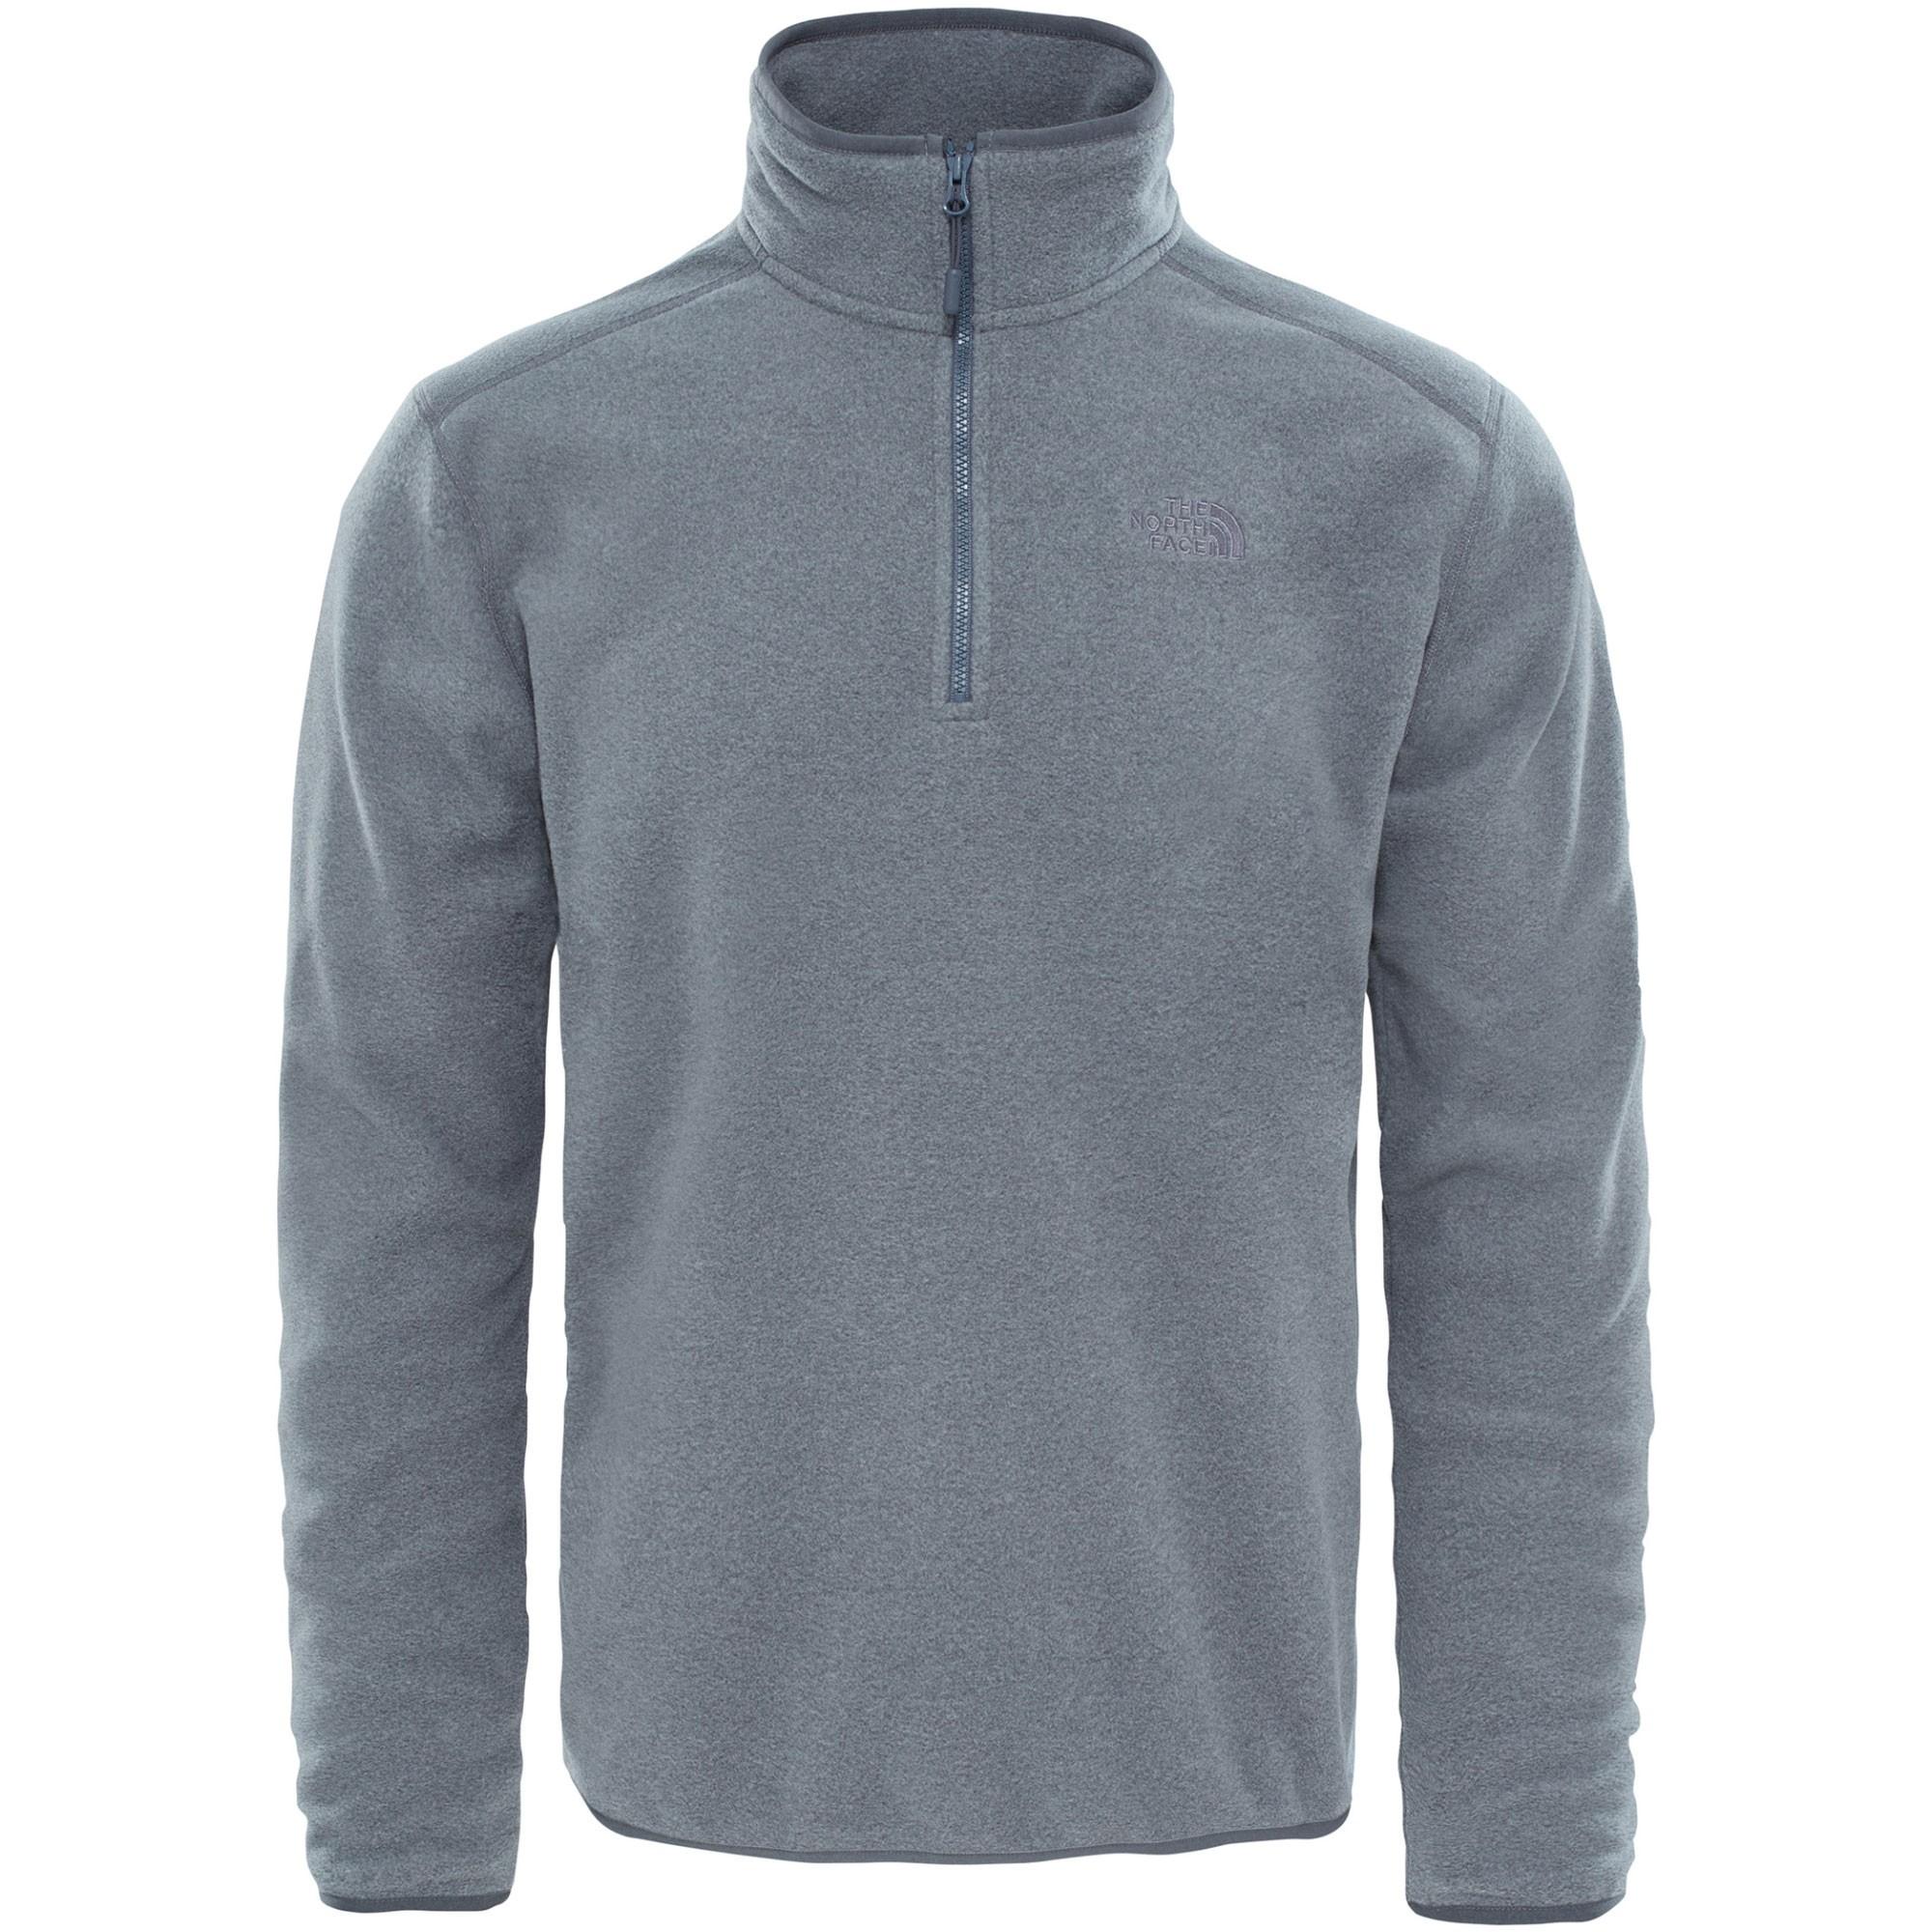 The North Face 100 Glacier 1/4 Zip Fleece Pullover - TNF Medium Grey Heather/High Rise Grey